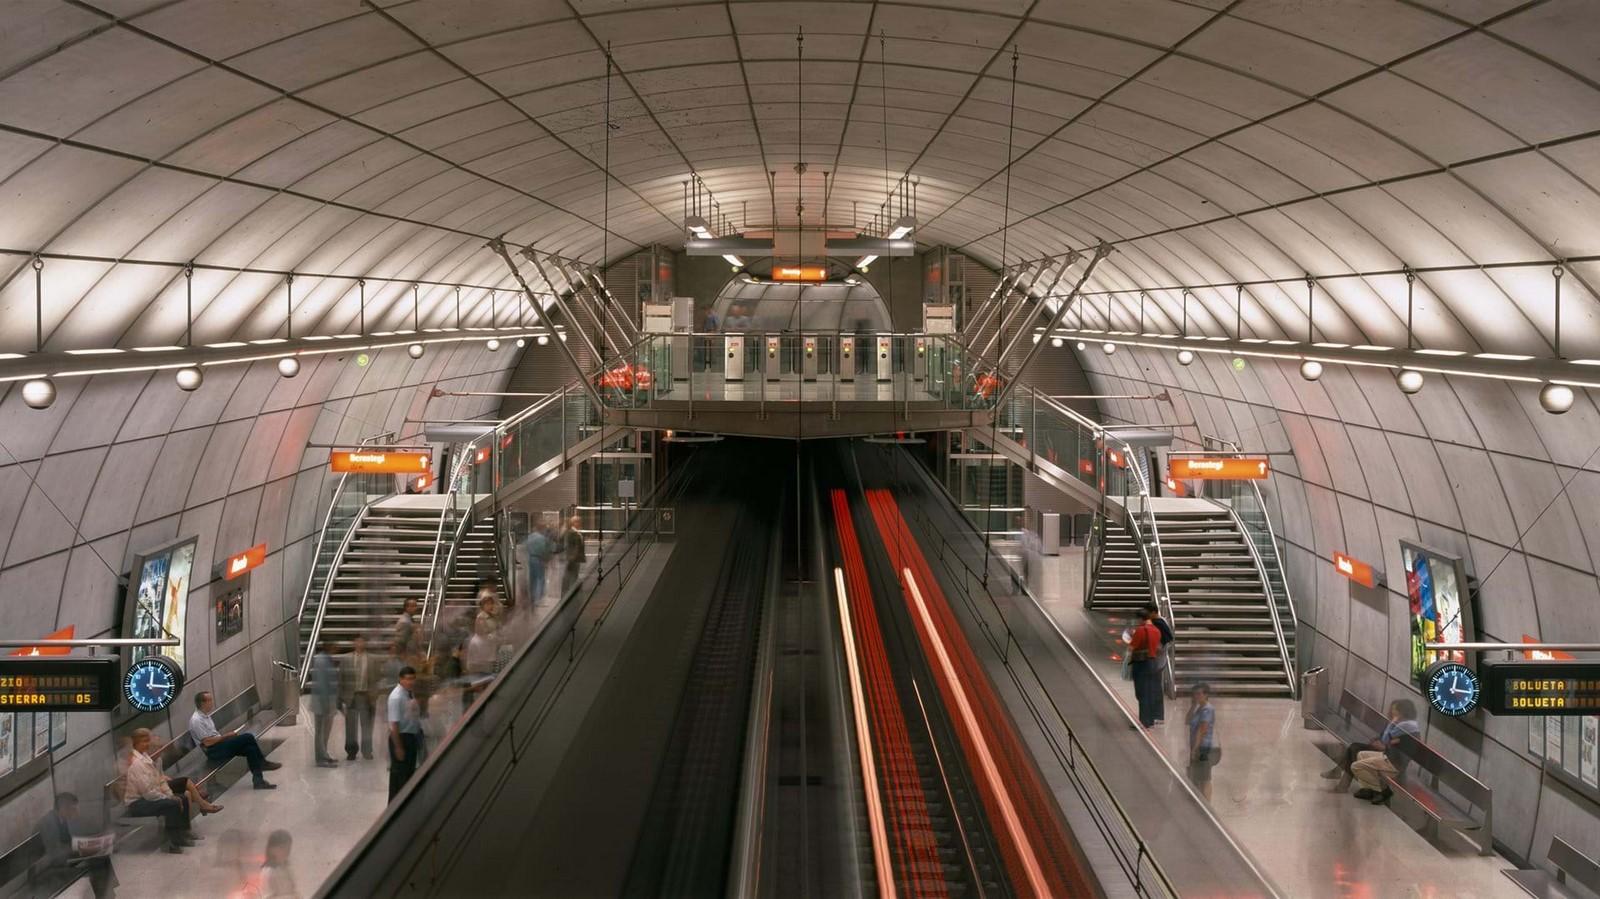 Bilbao Metro - Sheet2